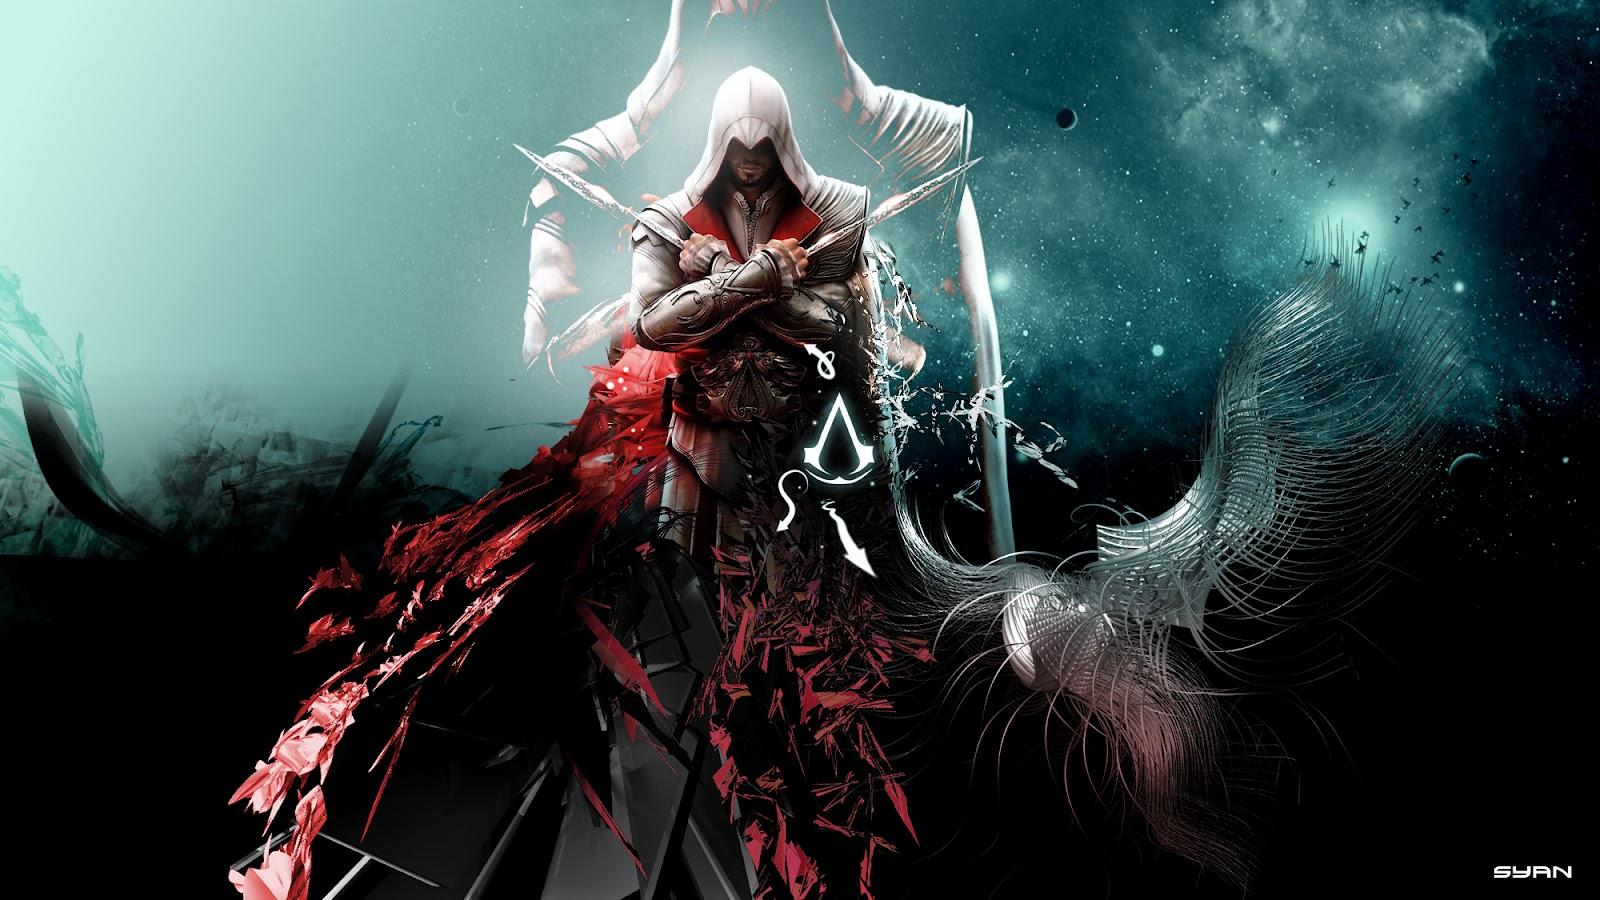 Assassin Creed HD Wallpaper 1080p PiCsHoliC 1600x900